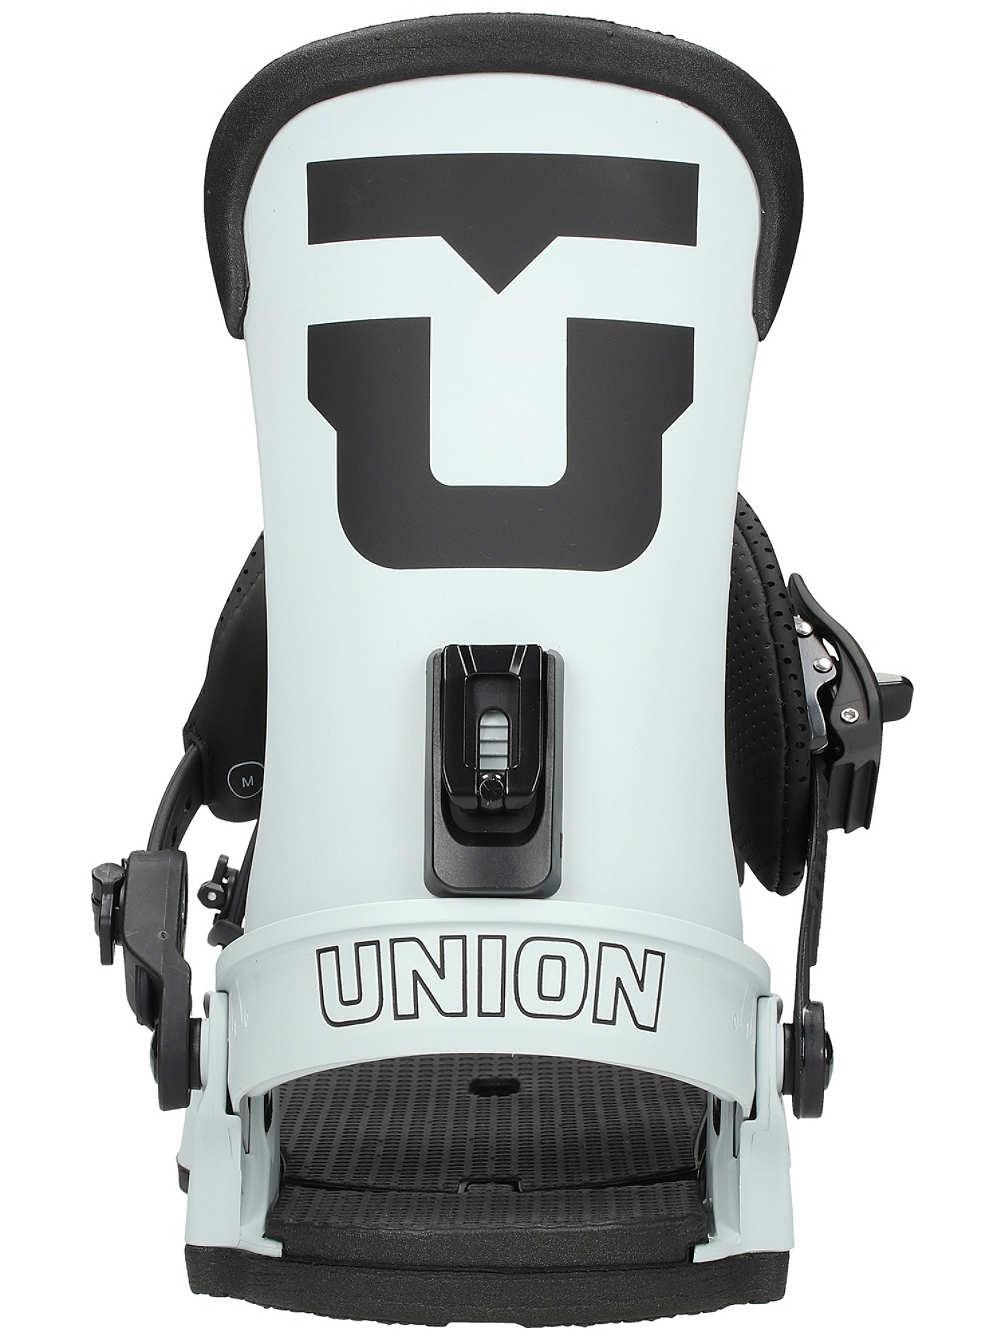 Union-Force-1